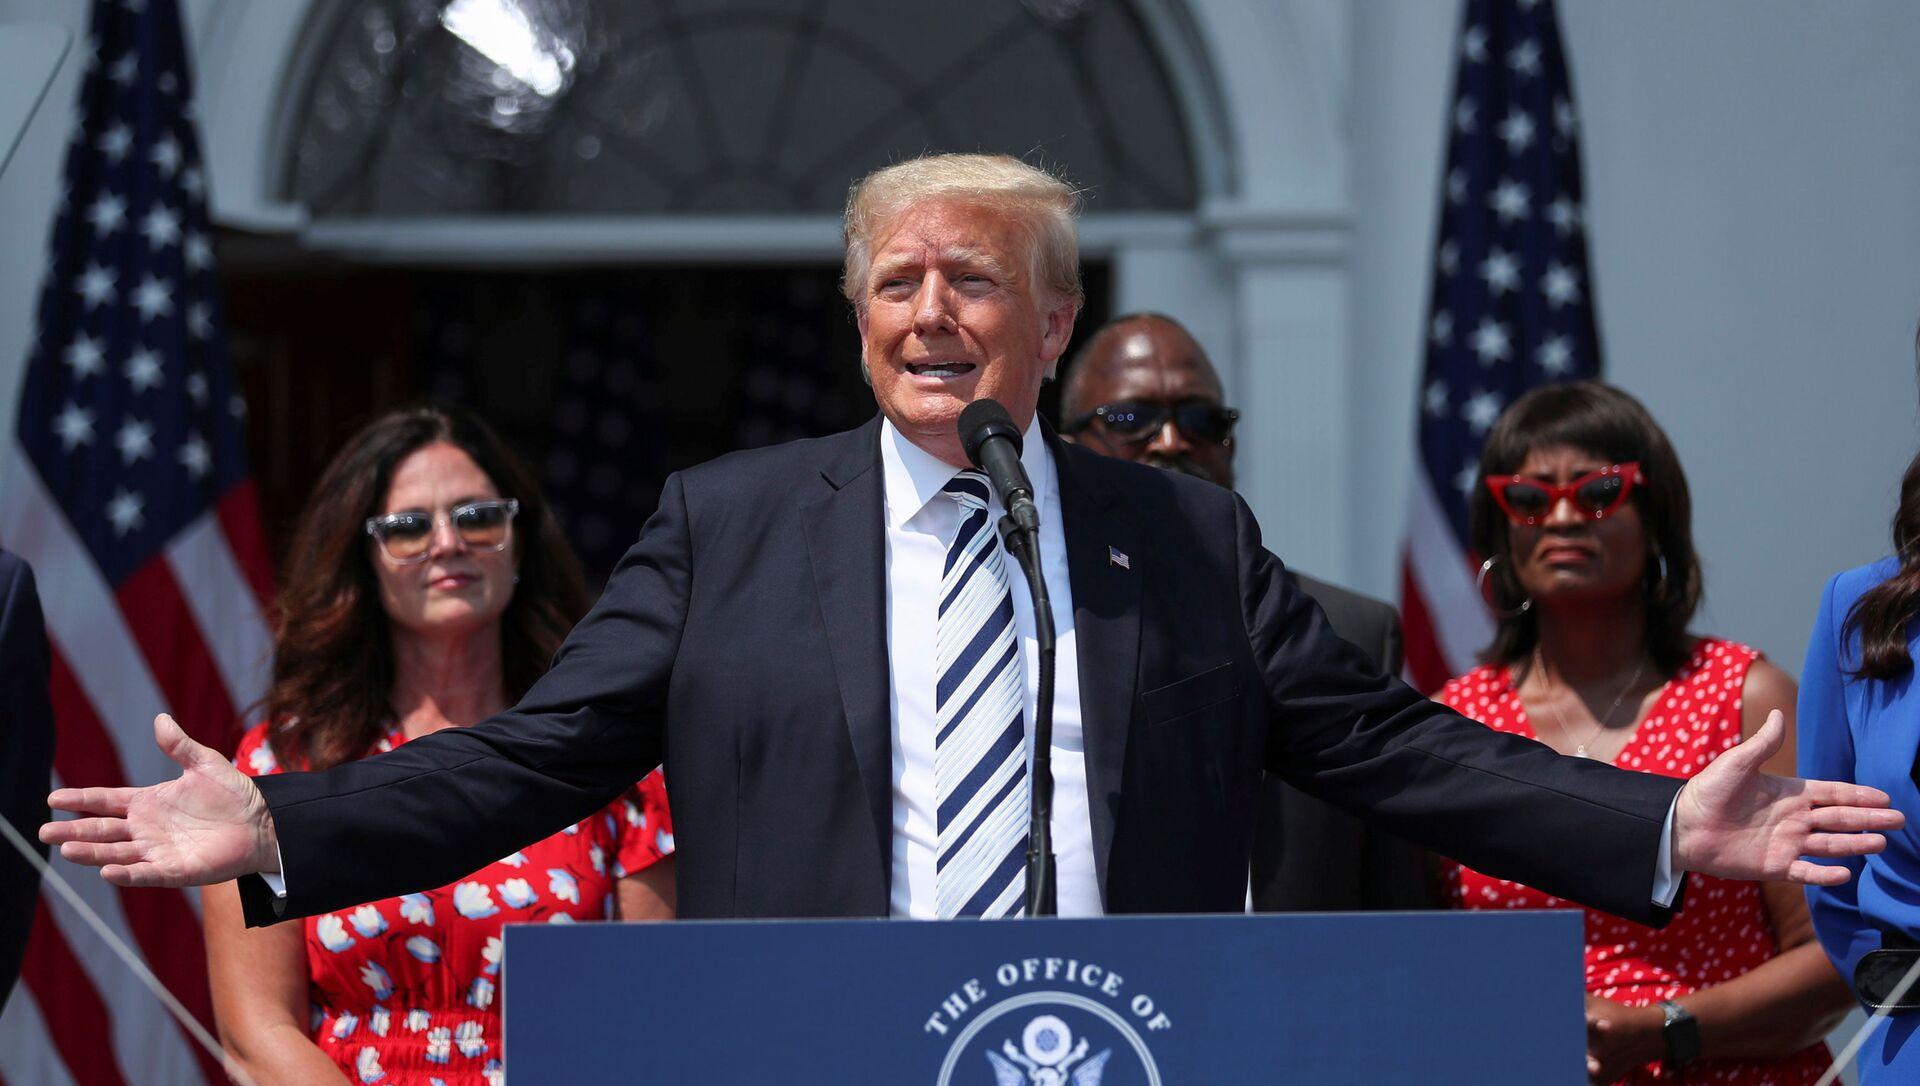 Former U.S. President Donald Trump speaks to media at his golf club in Bedminster, New Jersey, U.S., July 7, 2021 - Sputnik International, 1920, 24.07.2021